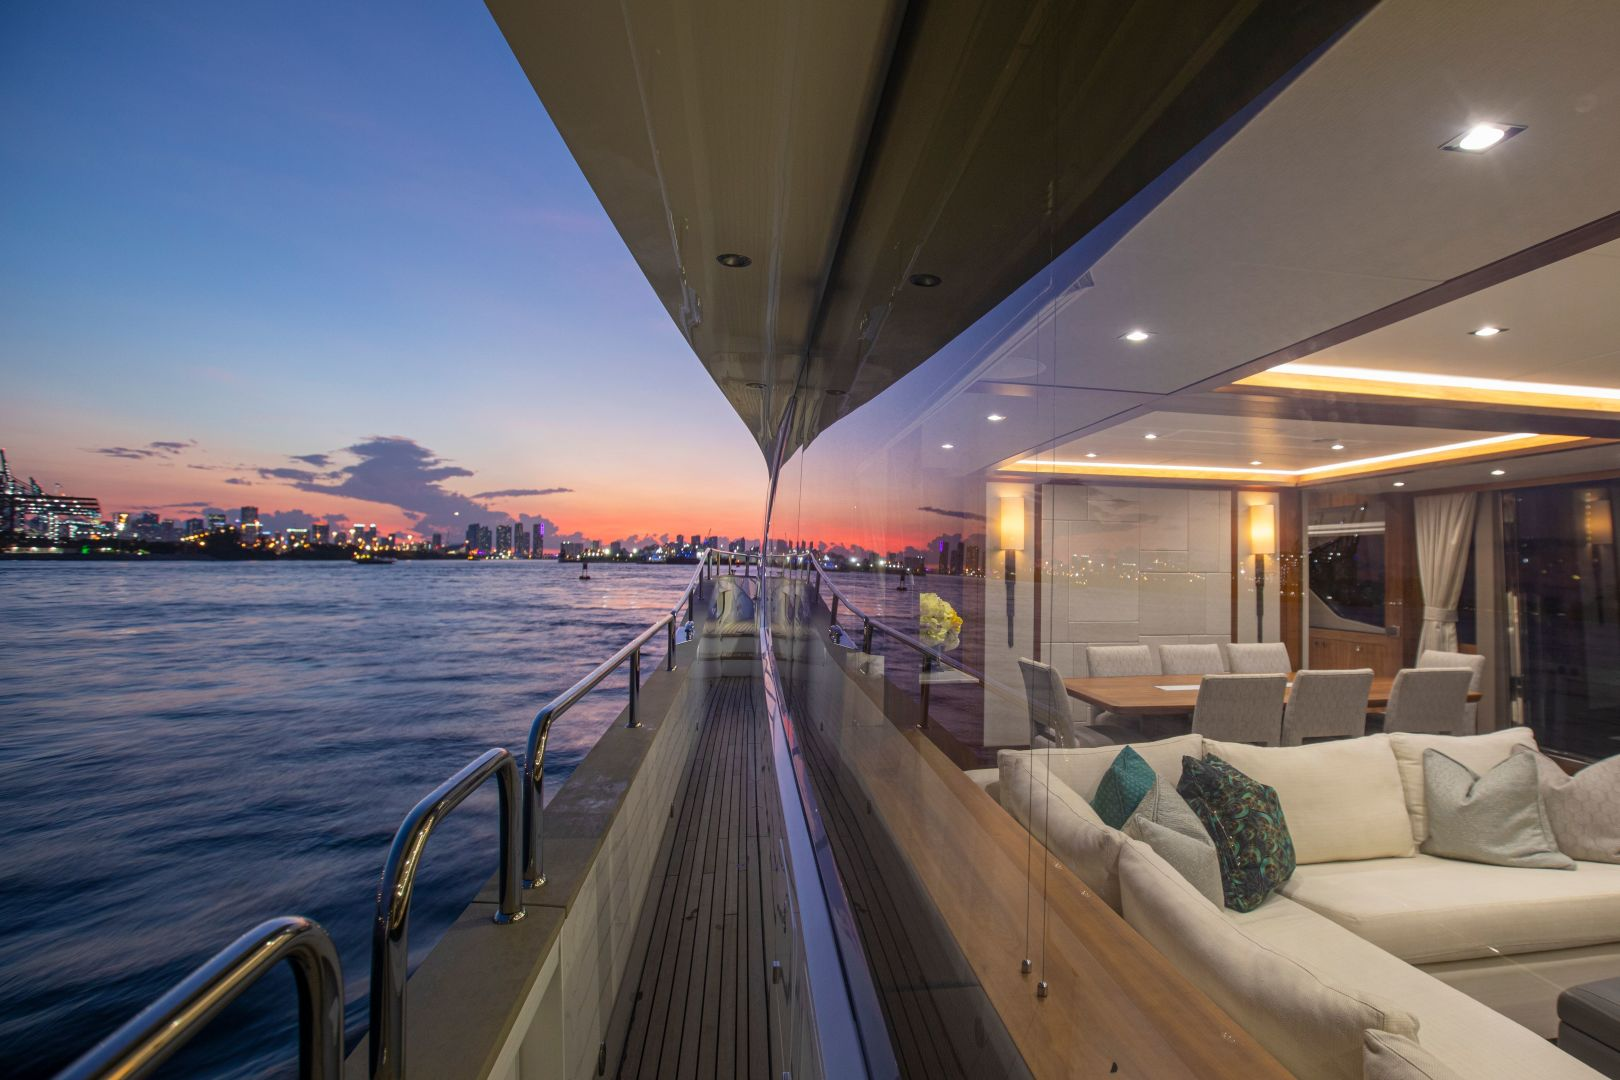 Sunseeker-95 Yacht 2017-Perseverance 3 Ft Lauderdale-Florida-United States-1400101   Thumbnail